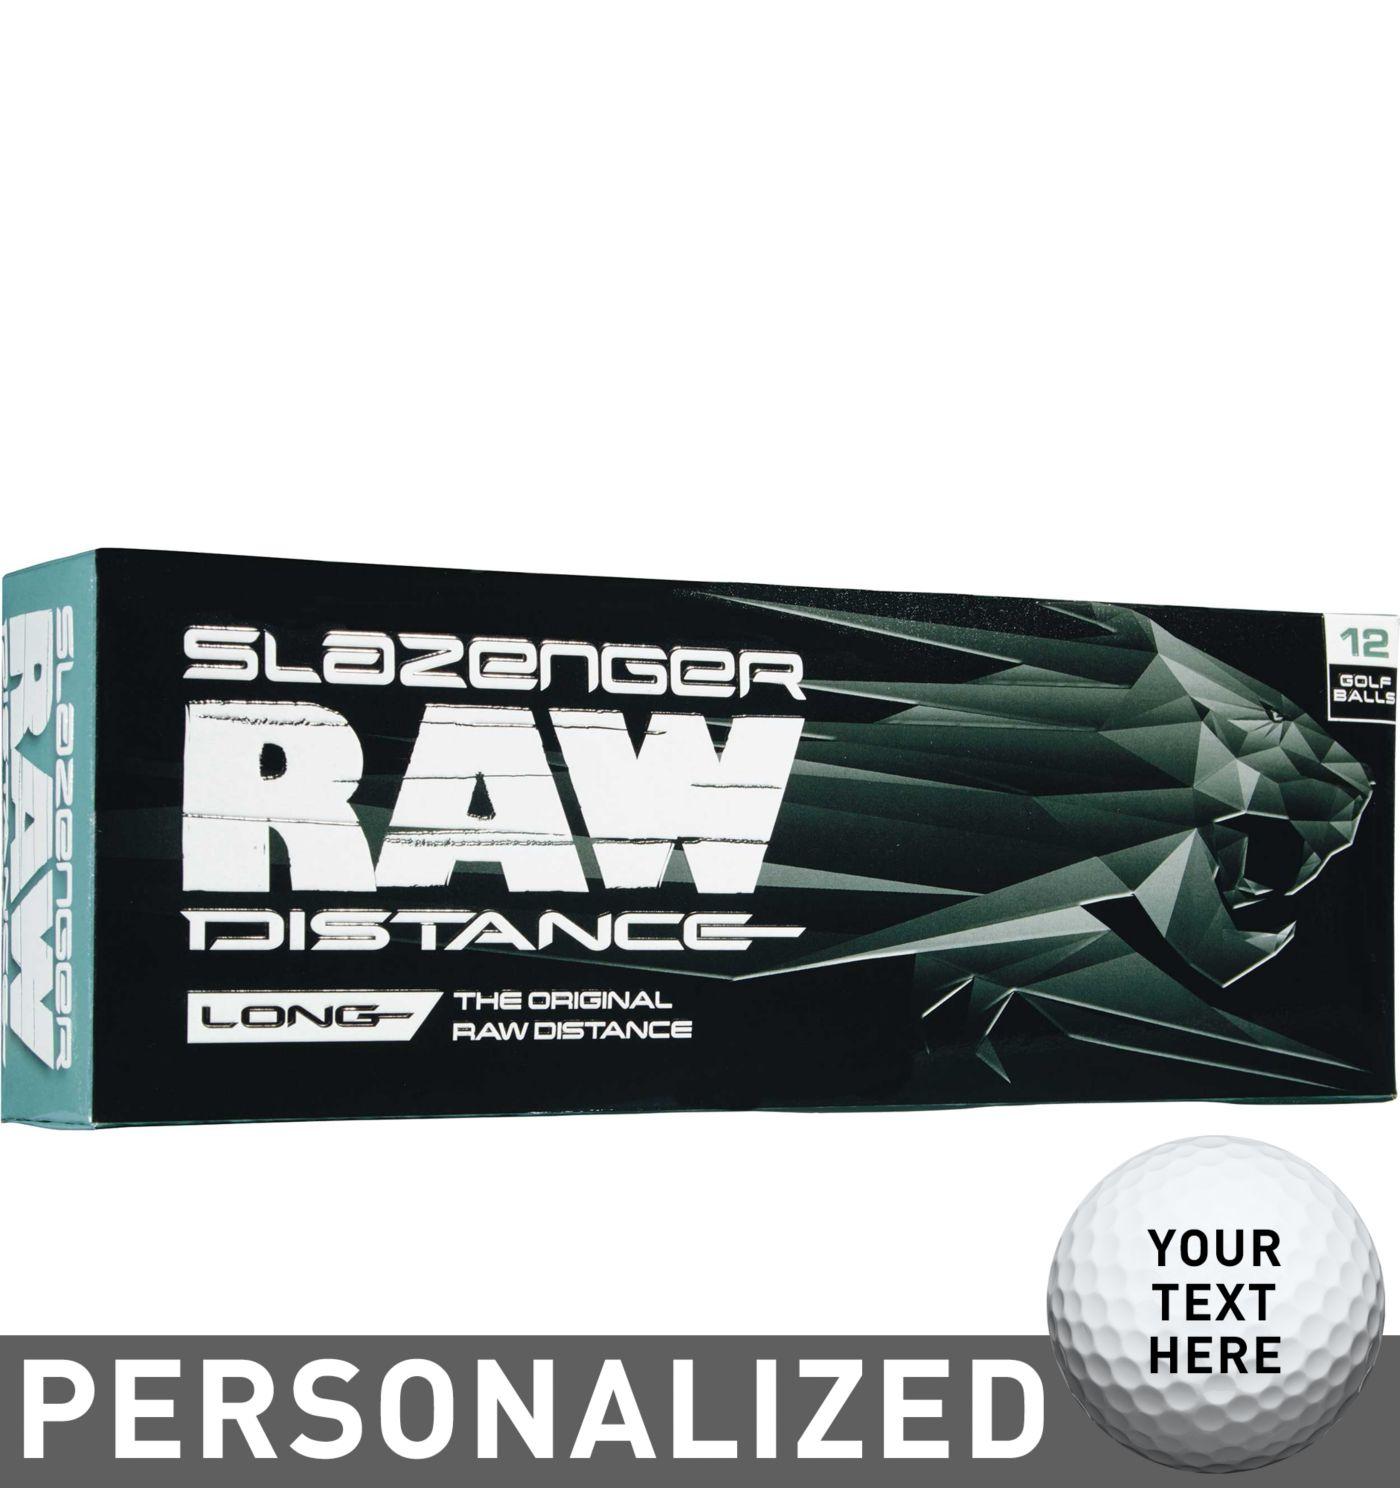 Slazenger 2017 Raw Distance Personalized Golf Balls